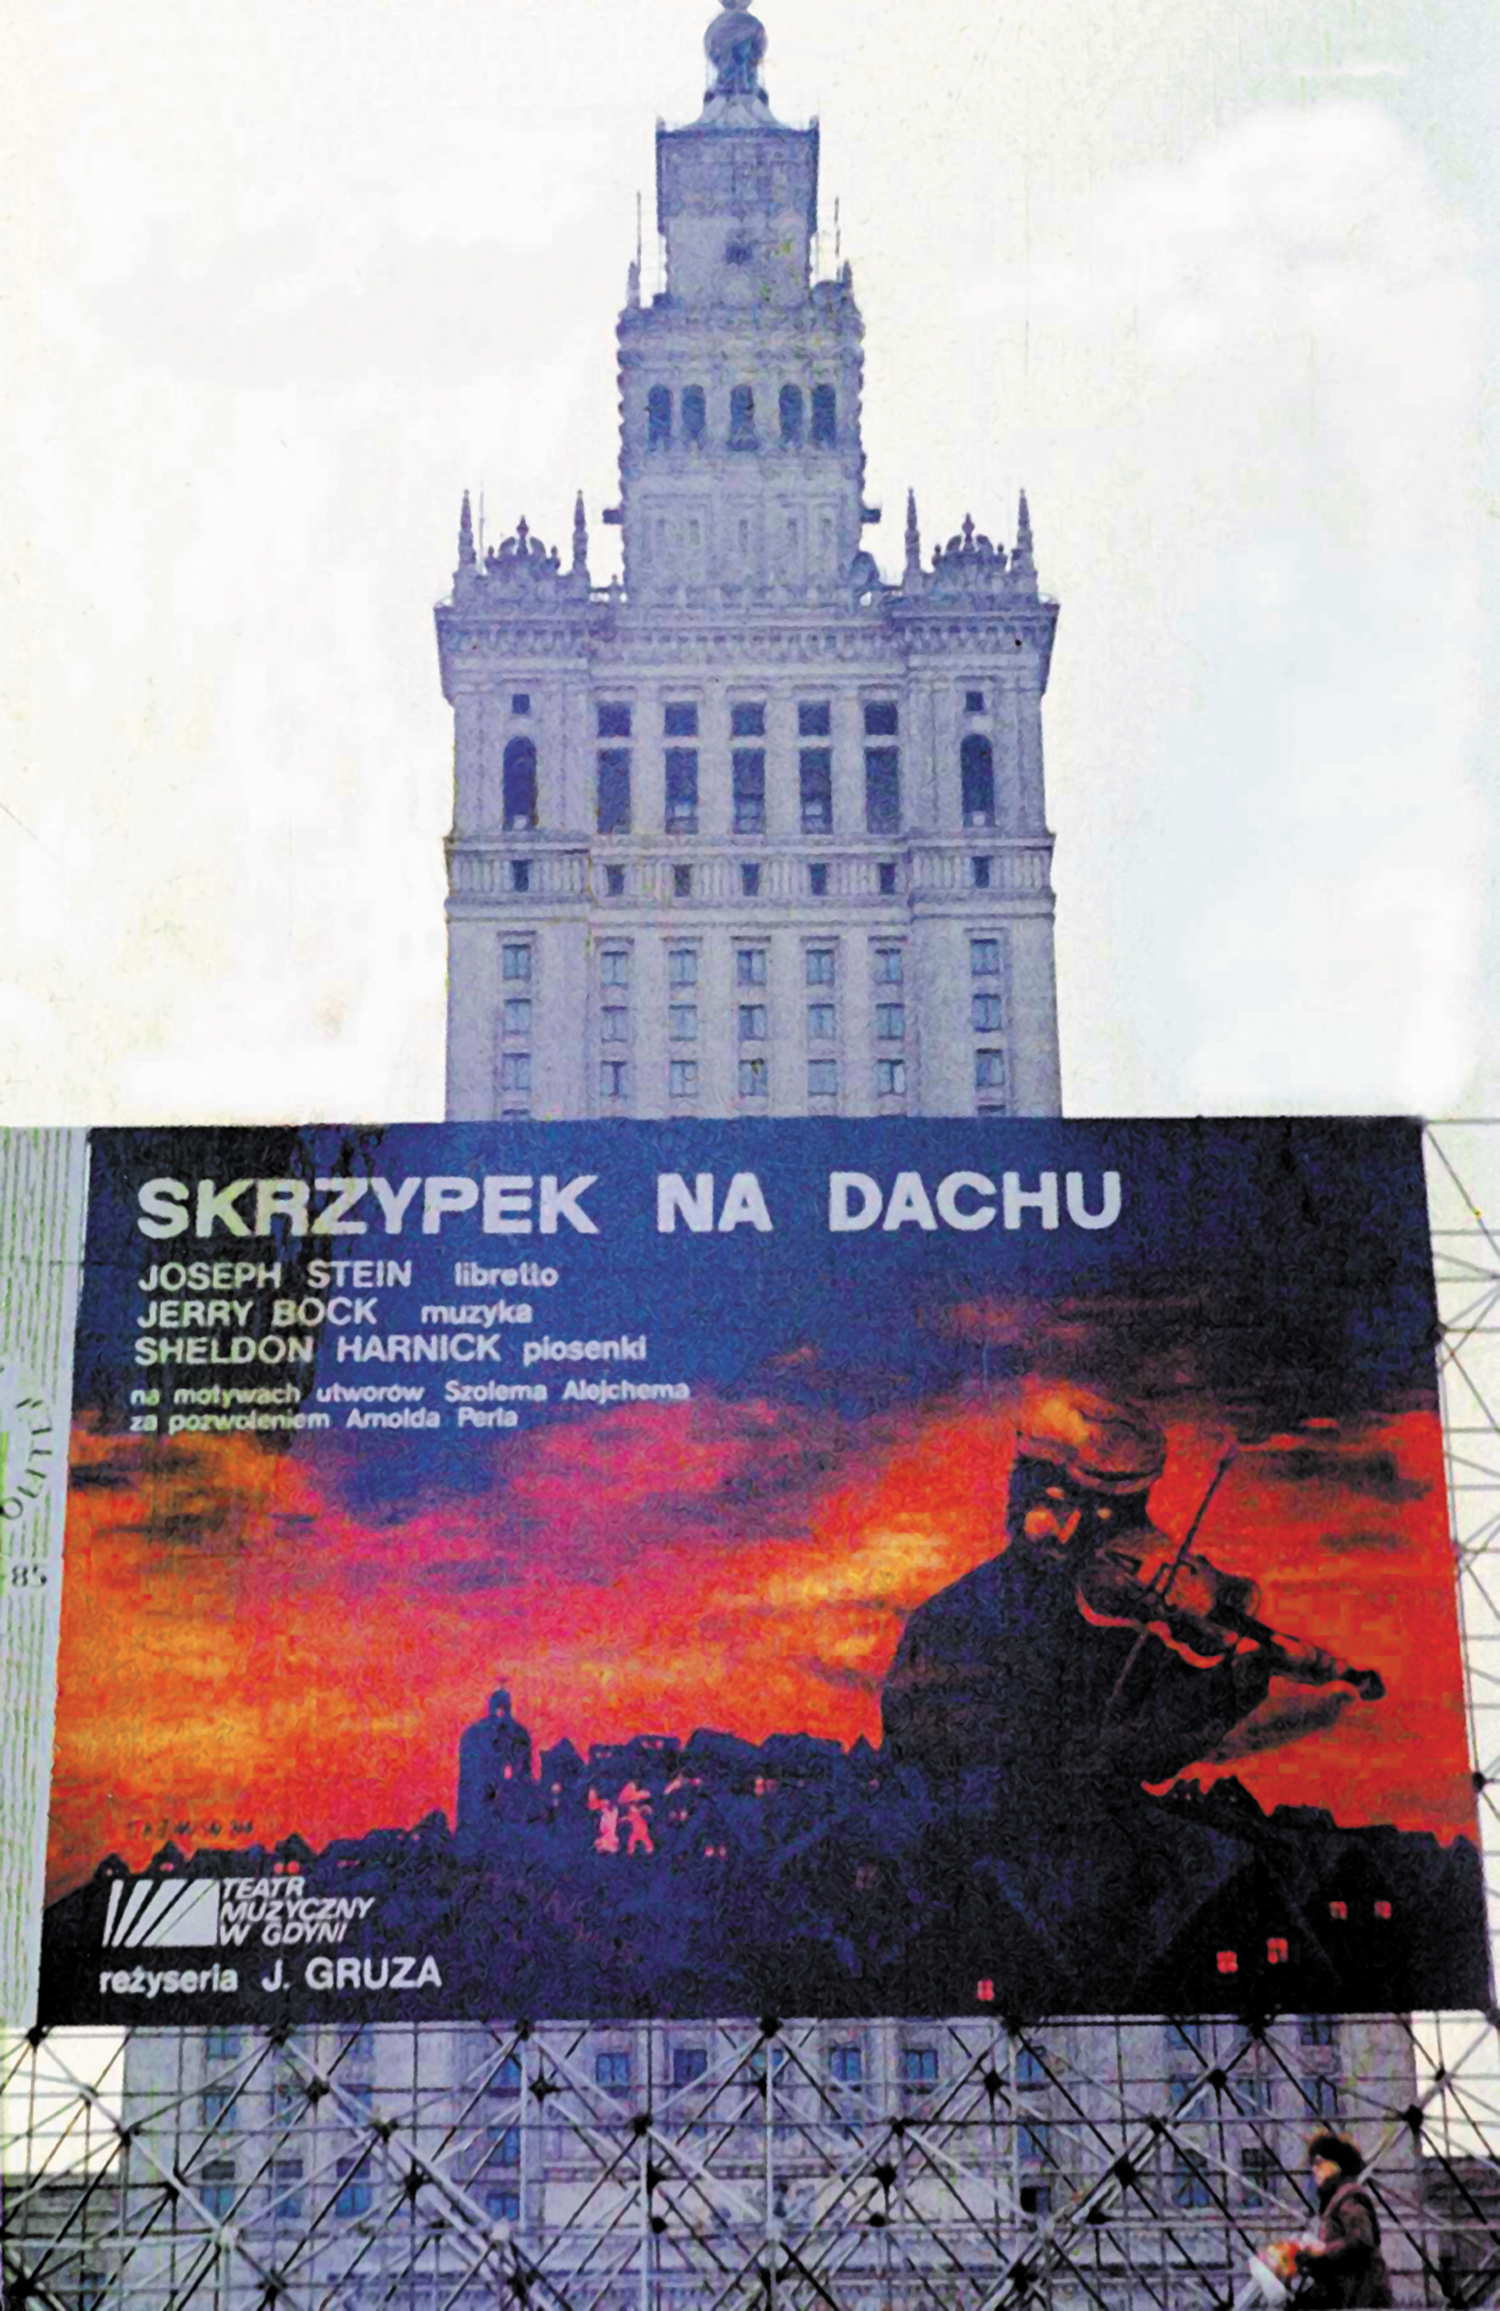 Billboard-advertises-Fiddler-on-the-Roof-in-Warsaw-1984